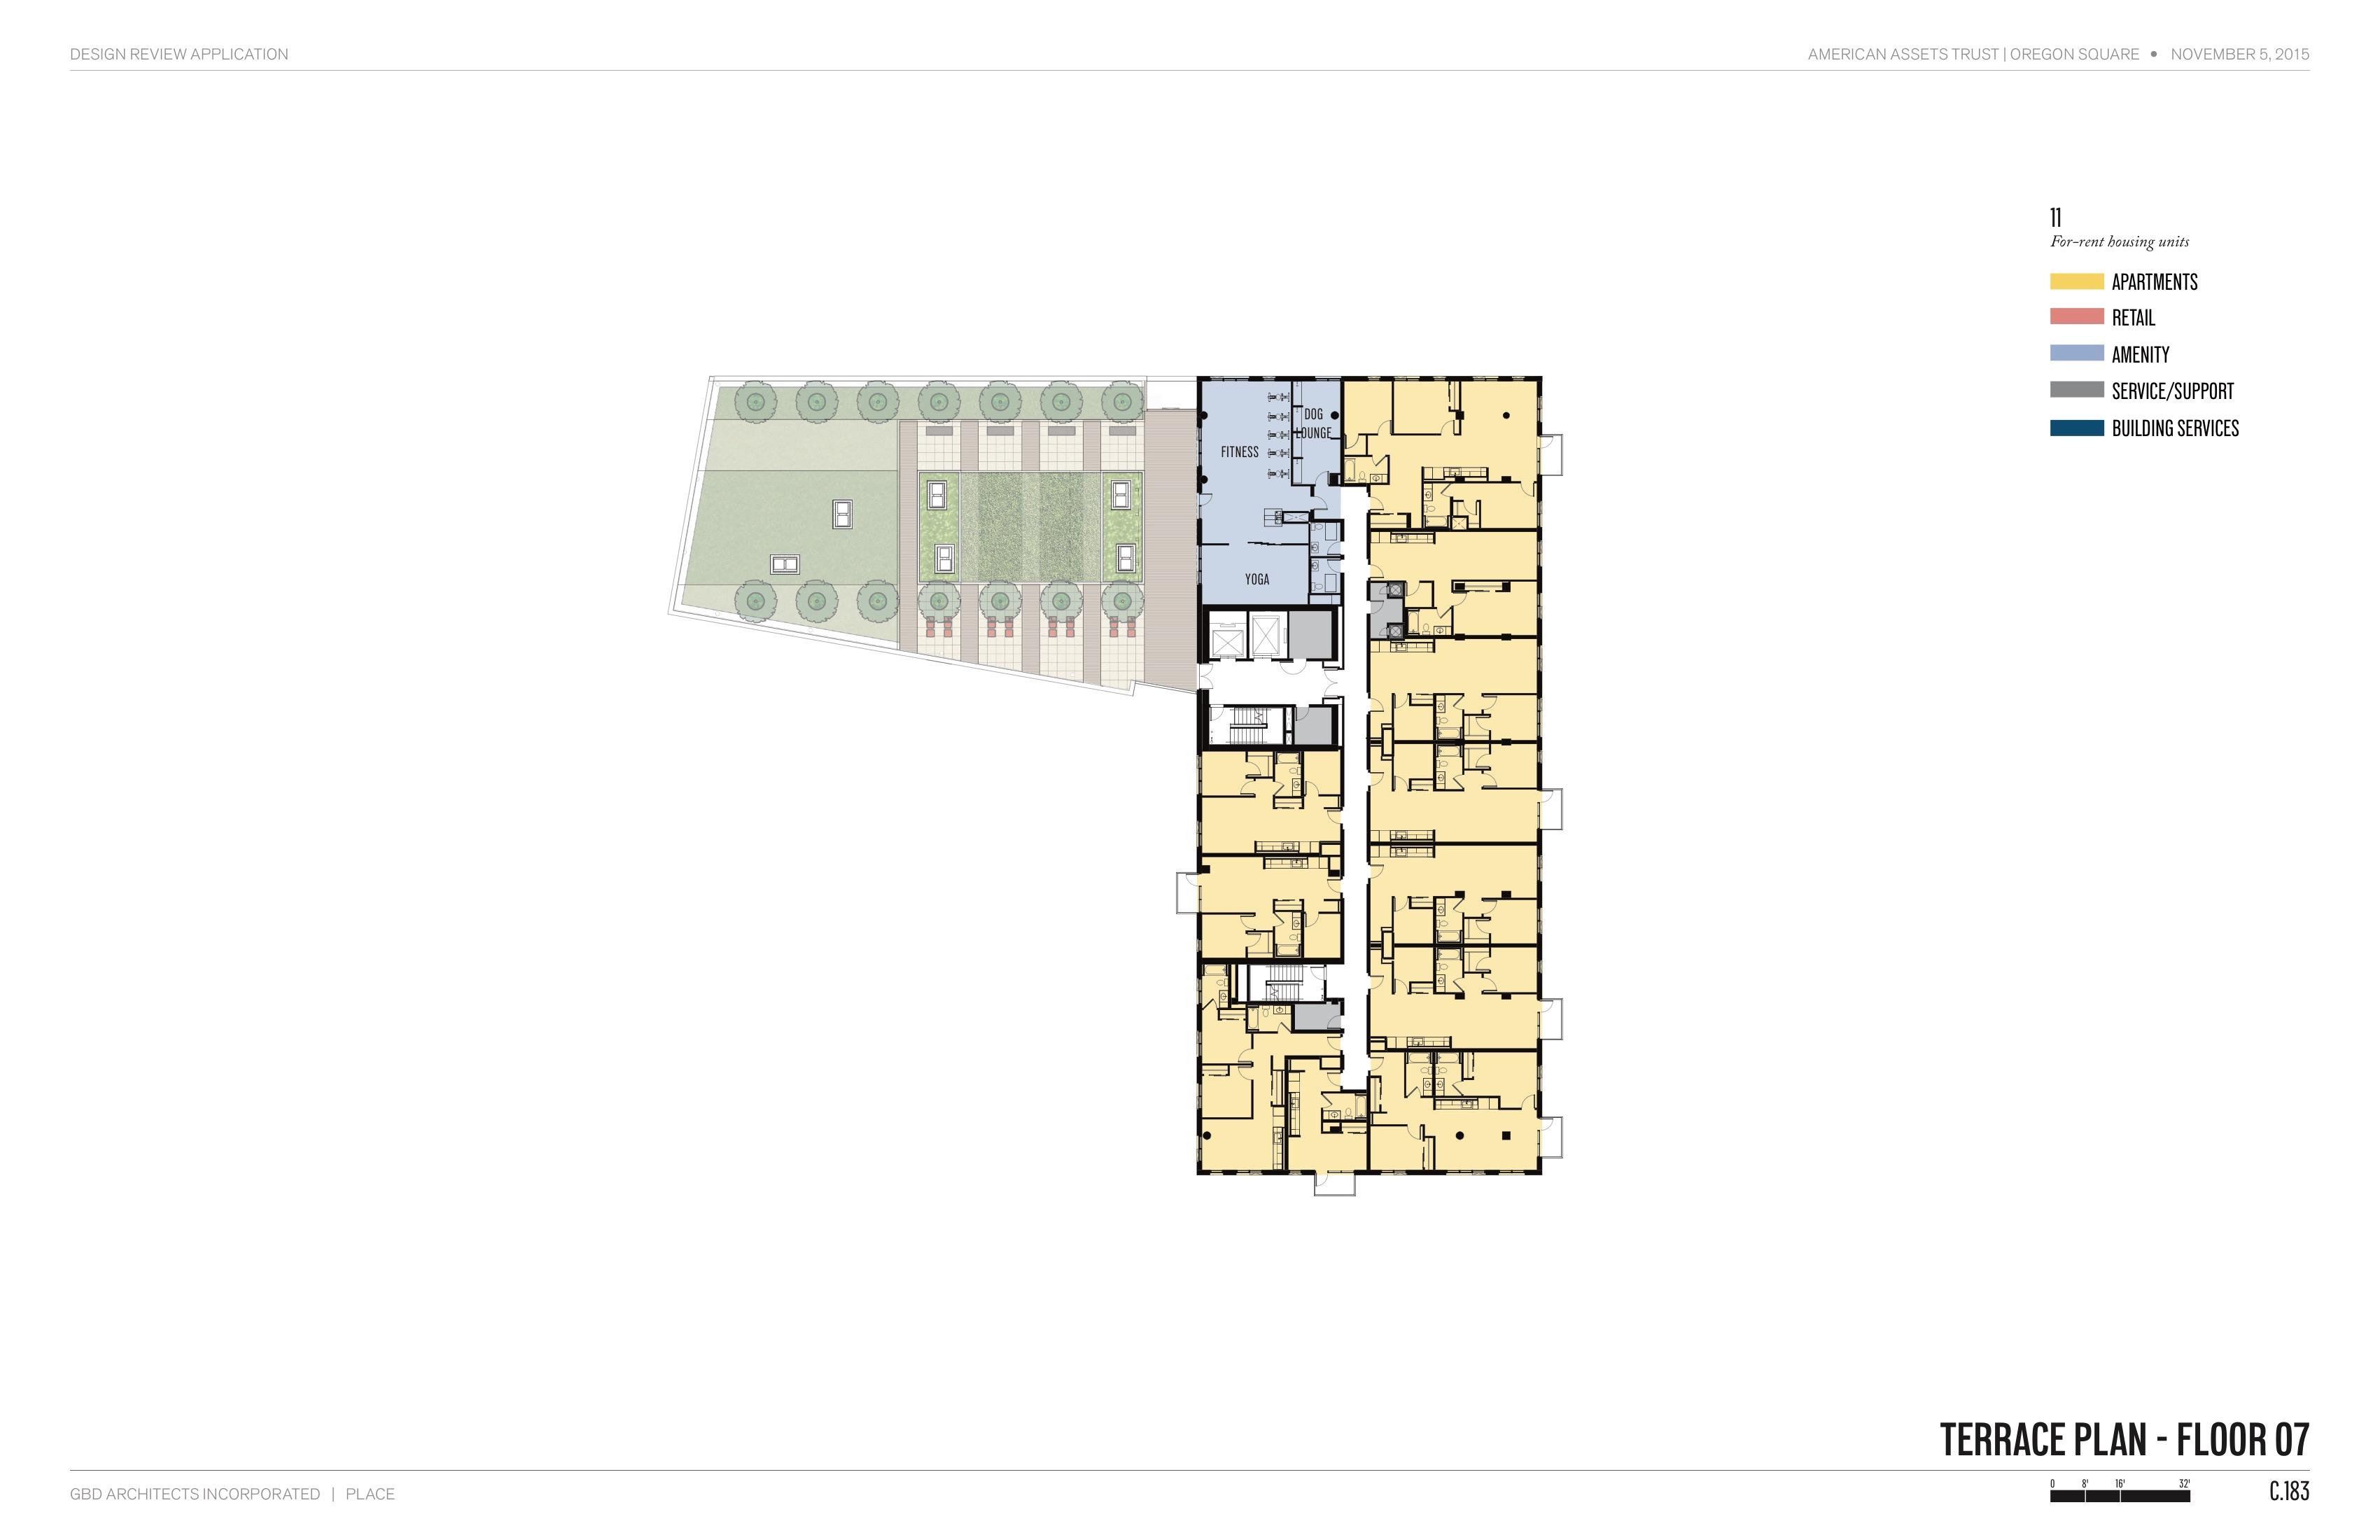 Oregon Square - Block 102